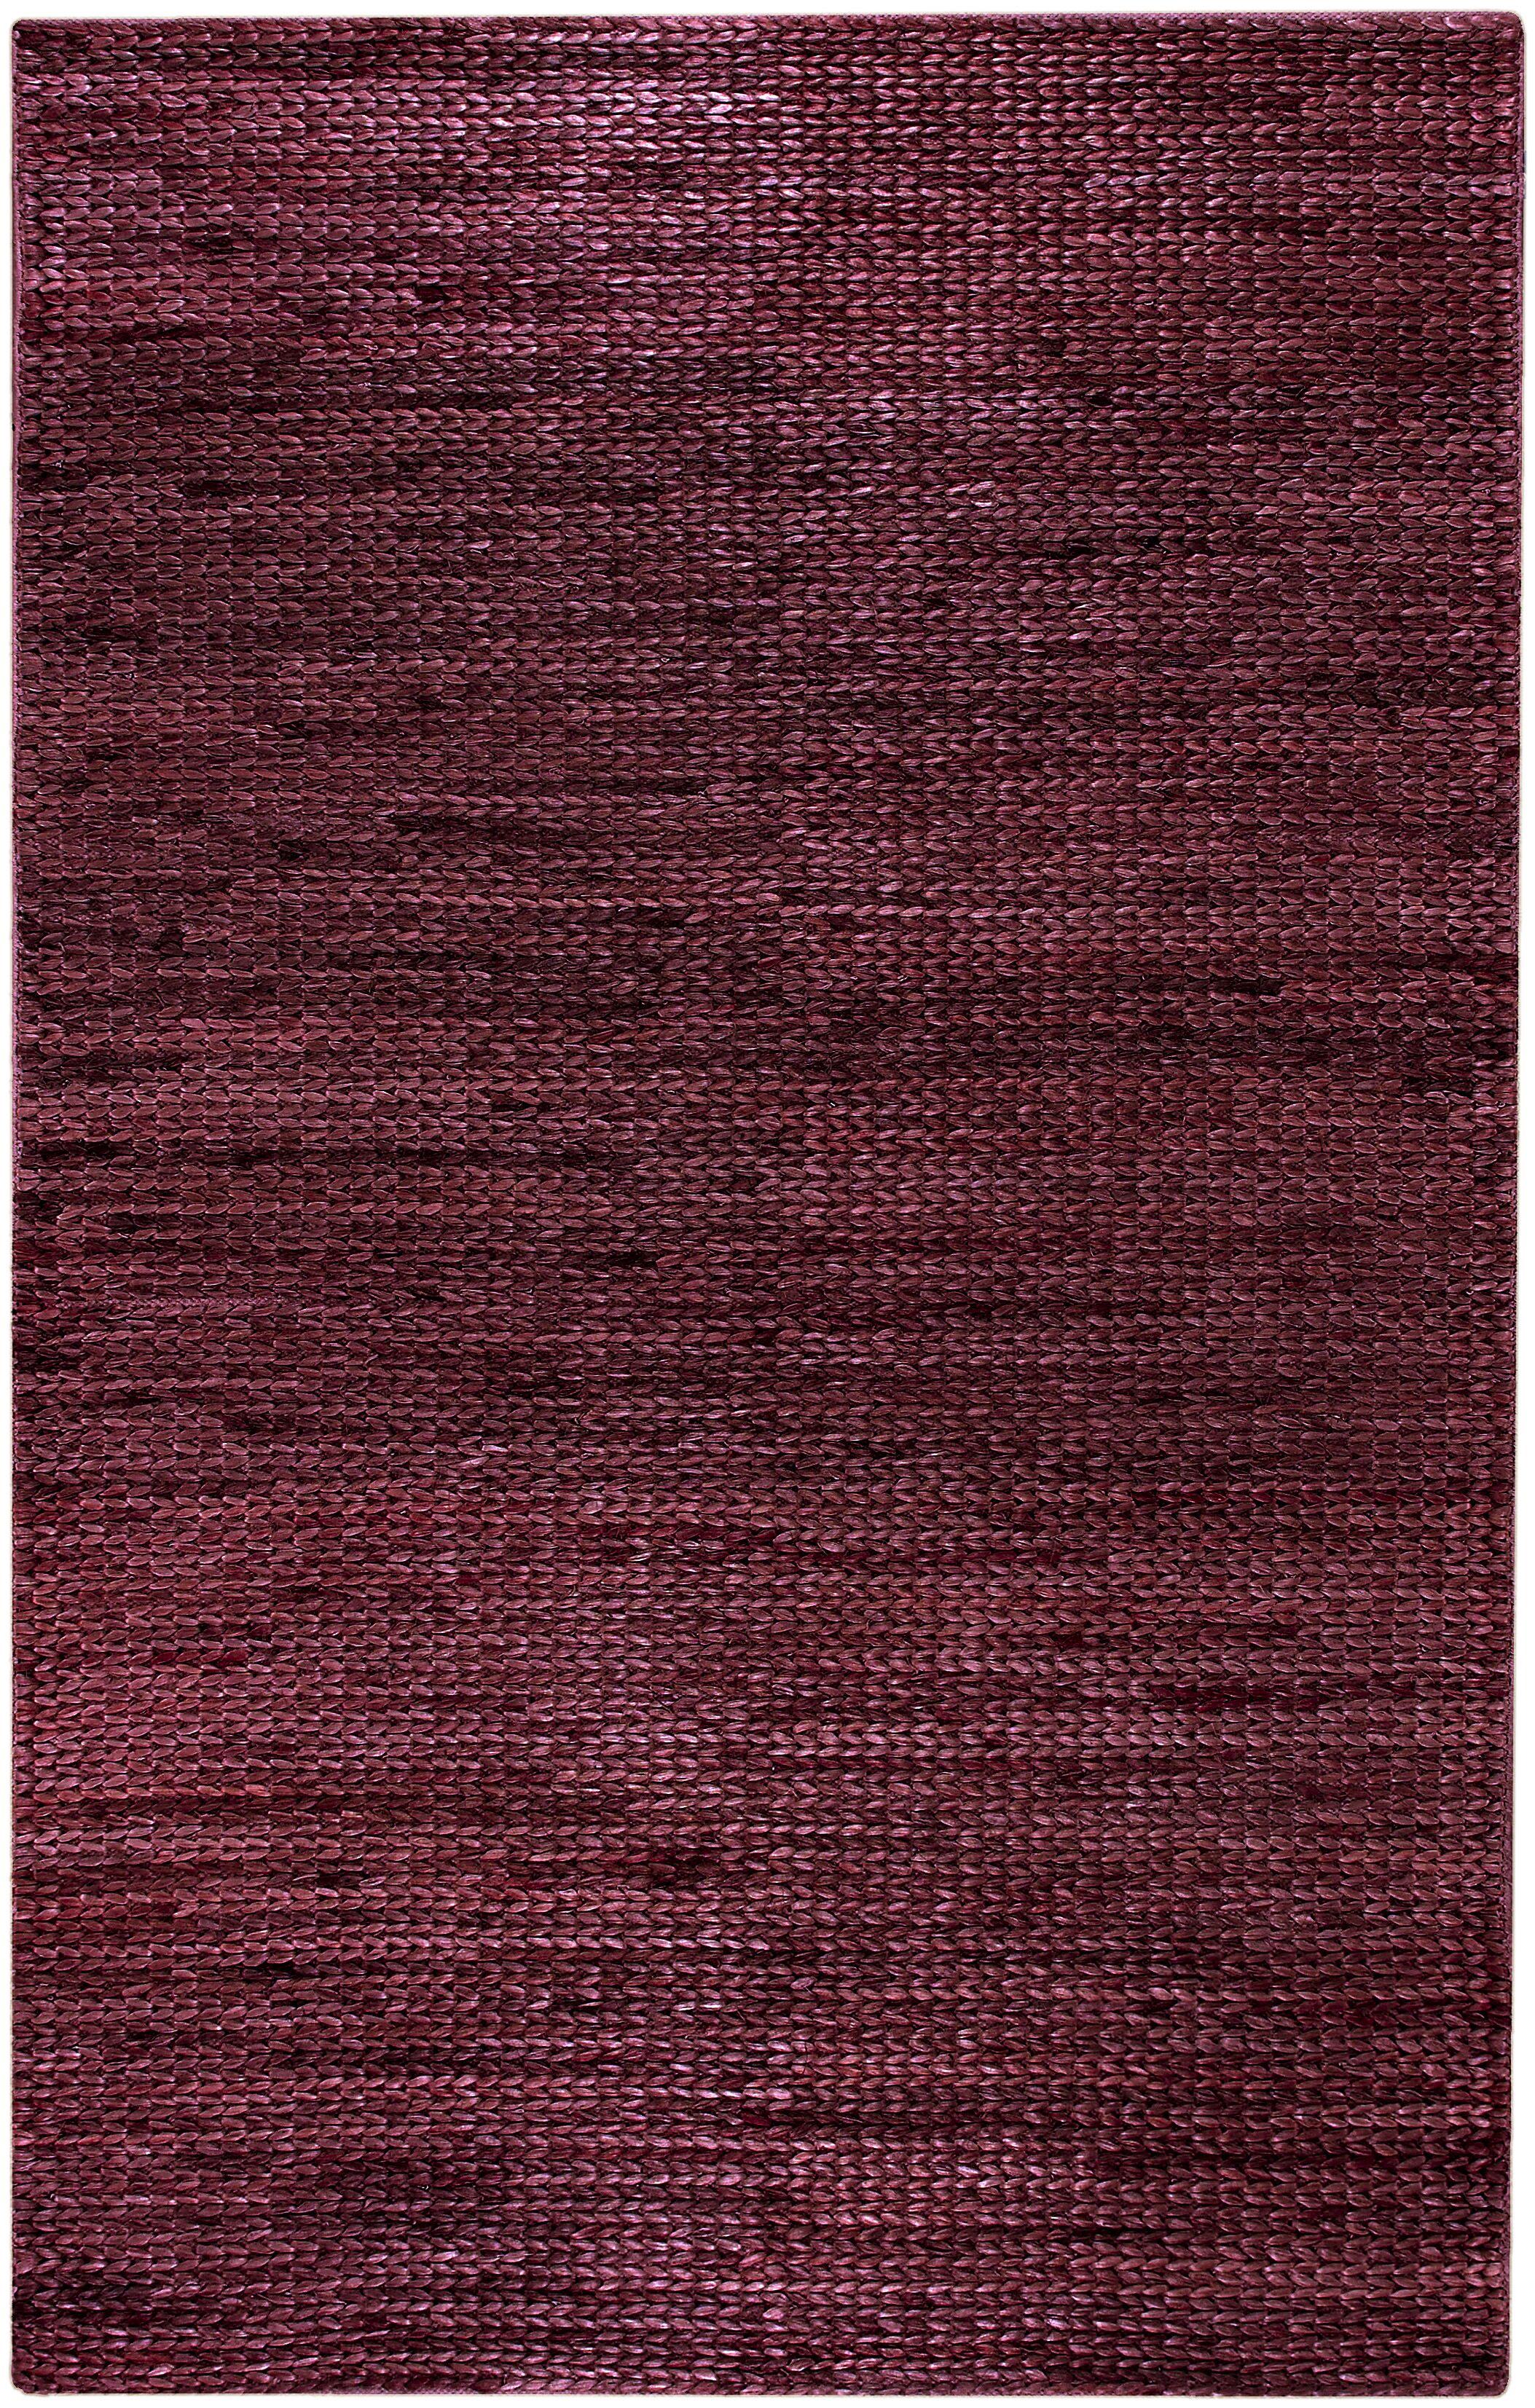 Tai Burgundy Area Rug Rug Size: Rectangle 5' x 8'